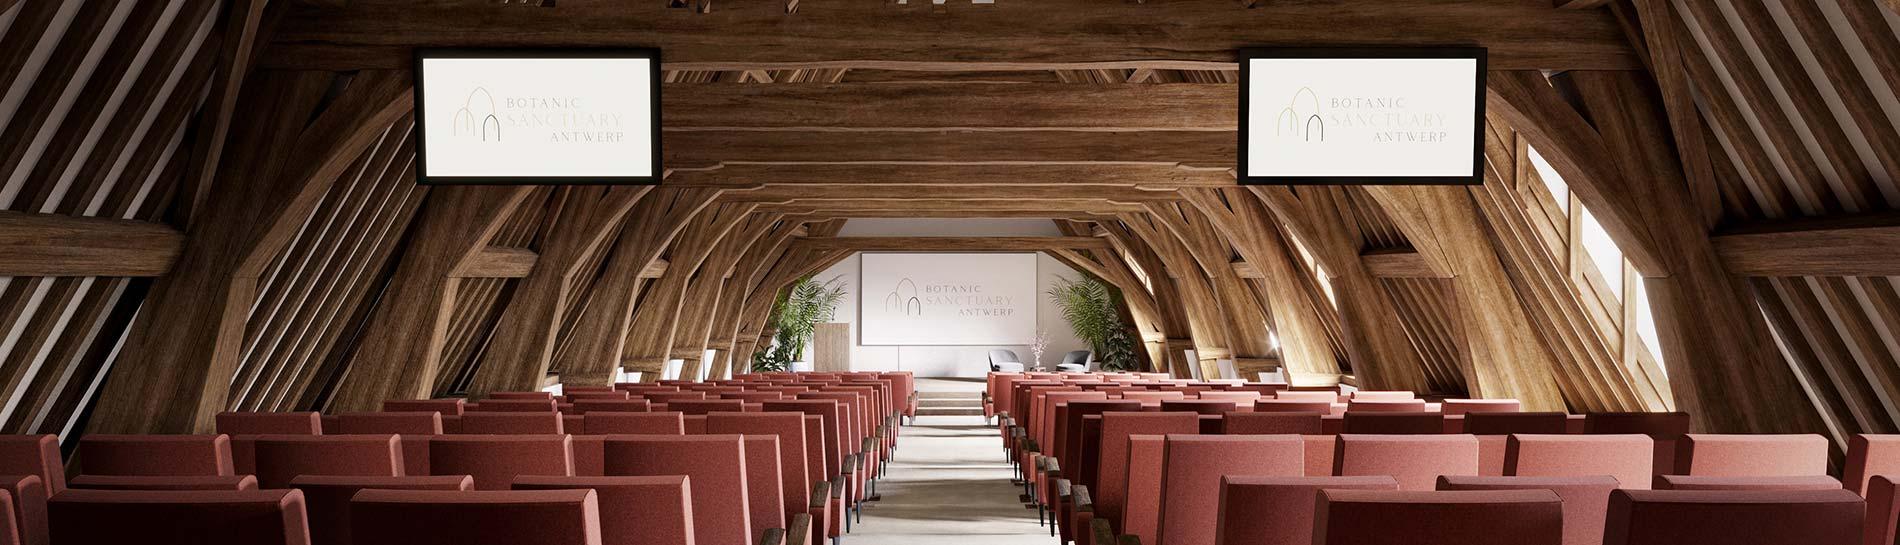 Niche destinations - Botanic Sanctuary Antwerp - meetings